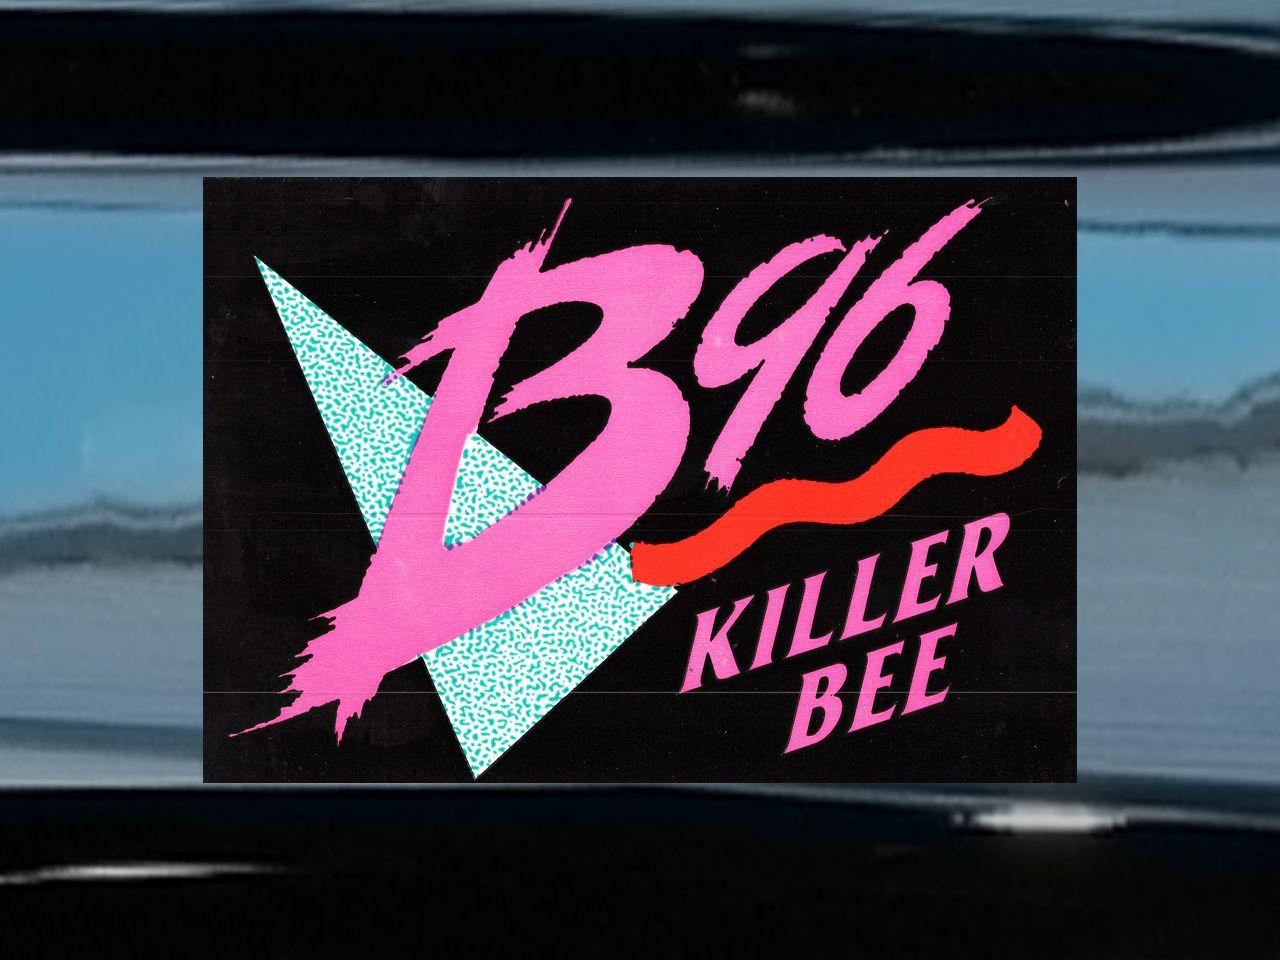 B96 Wbbm Chicago Illinois 96 3 [ 960 x 1280 Pixel ]